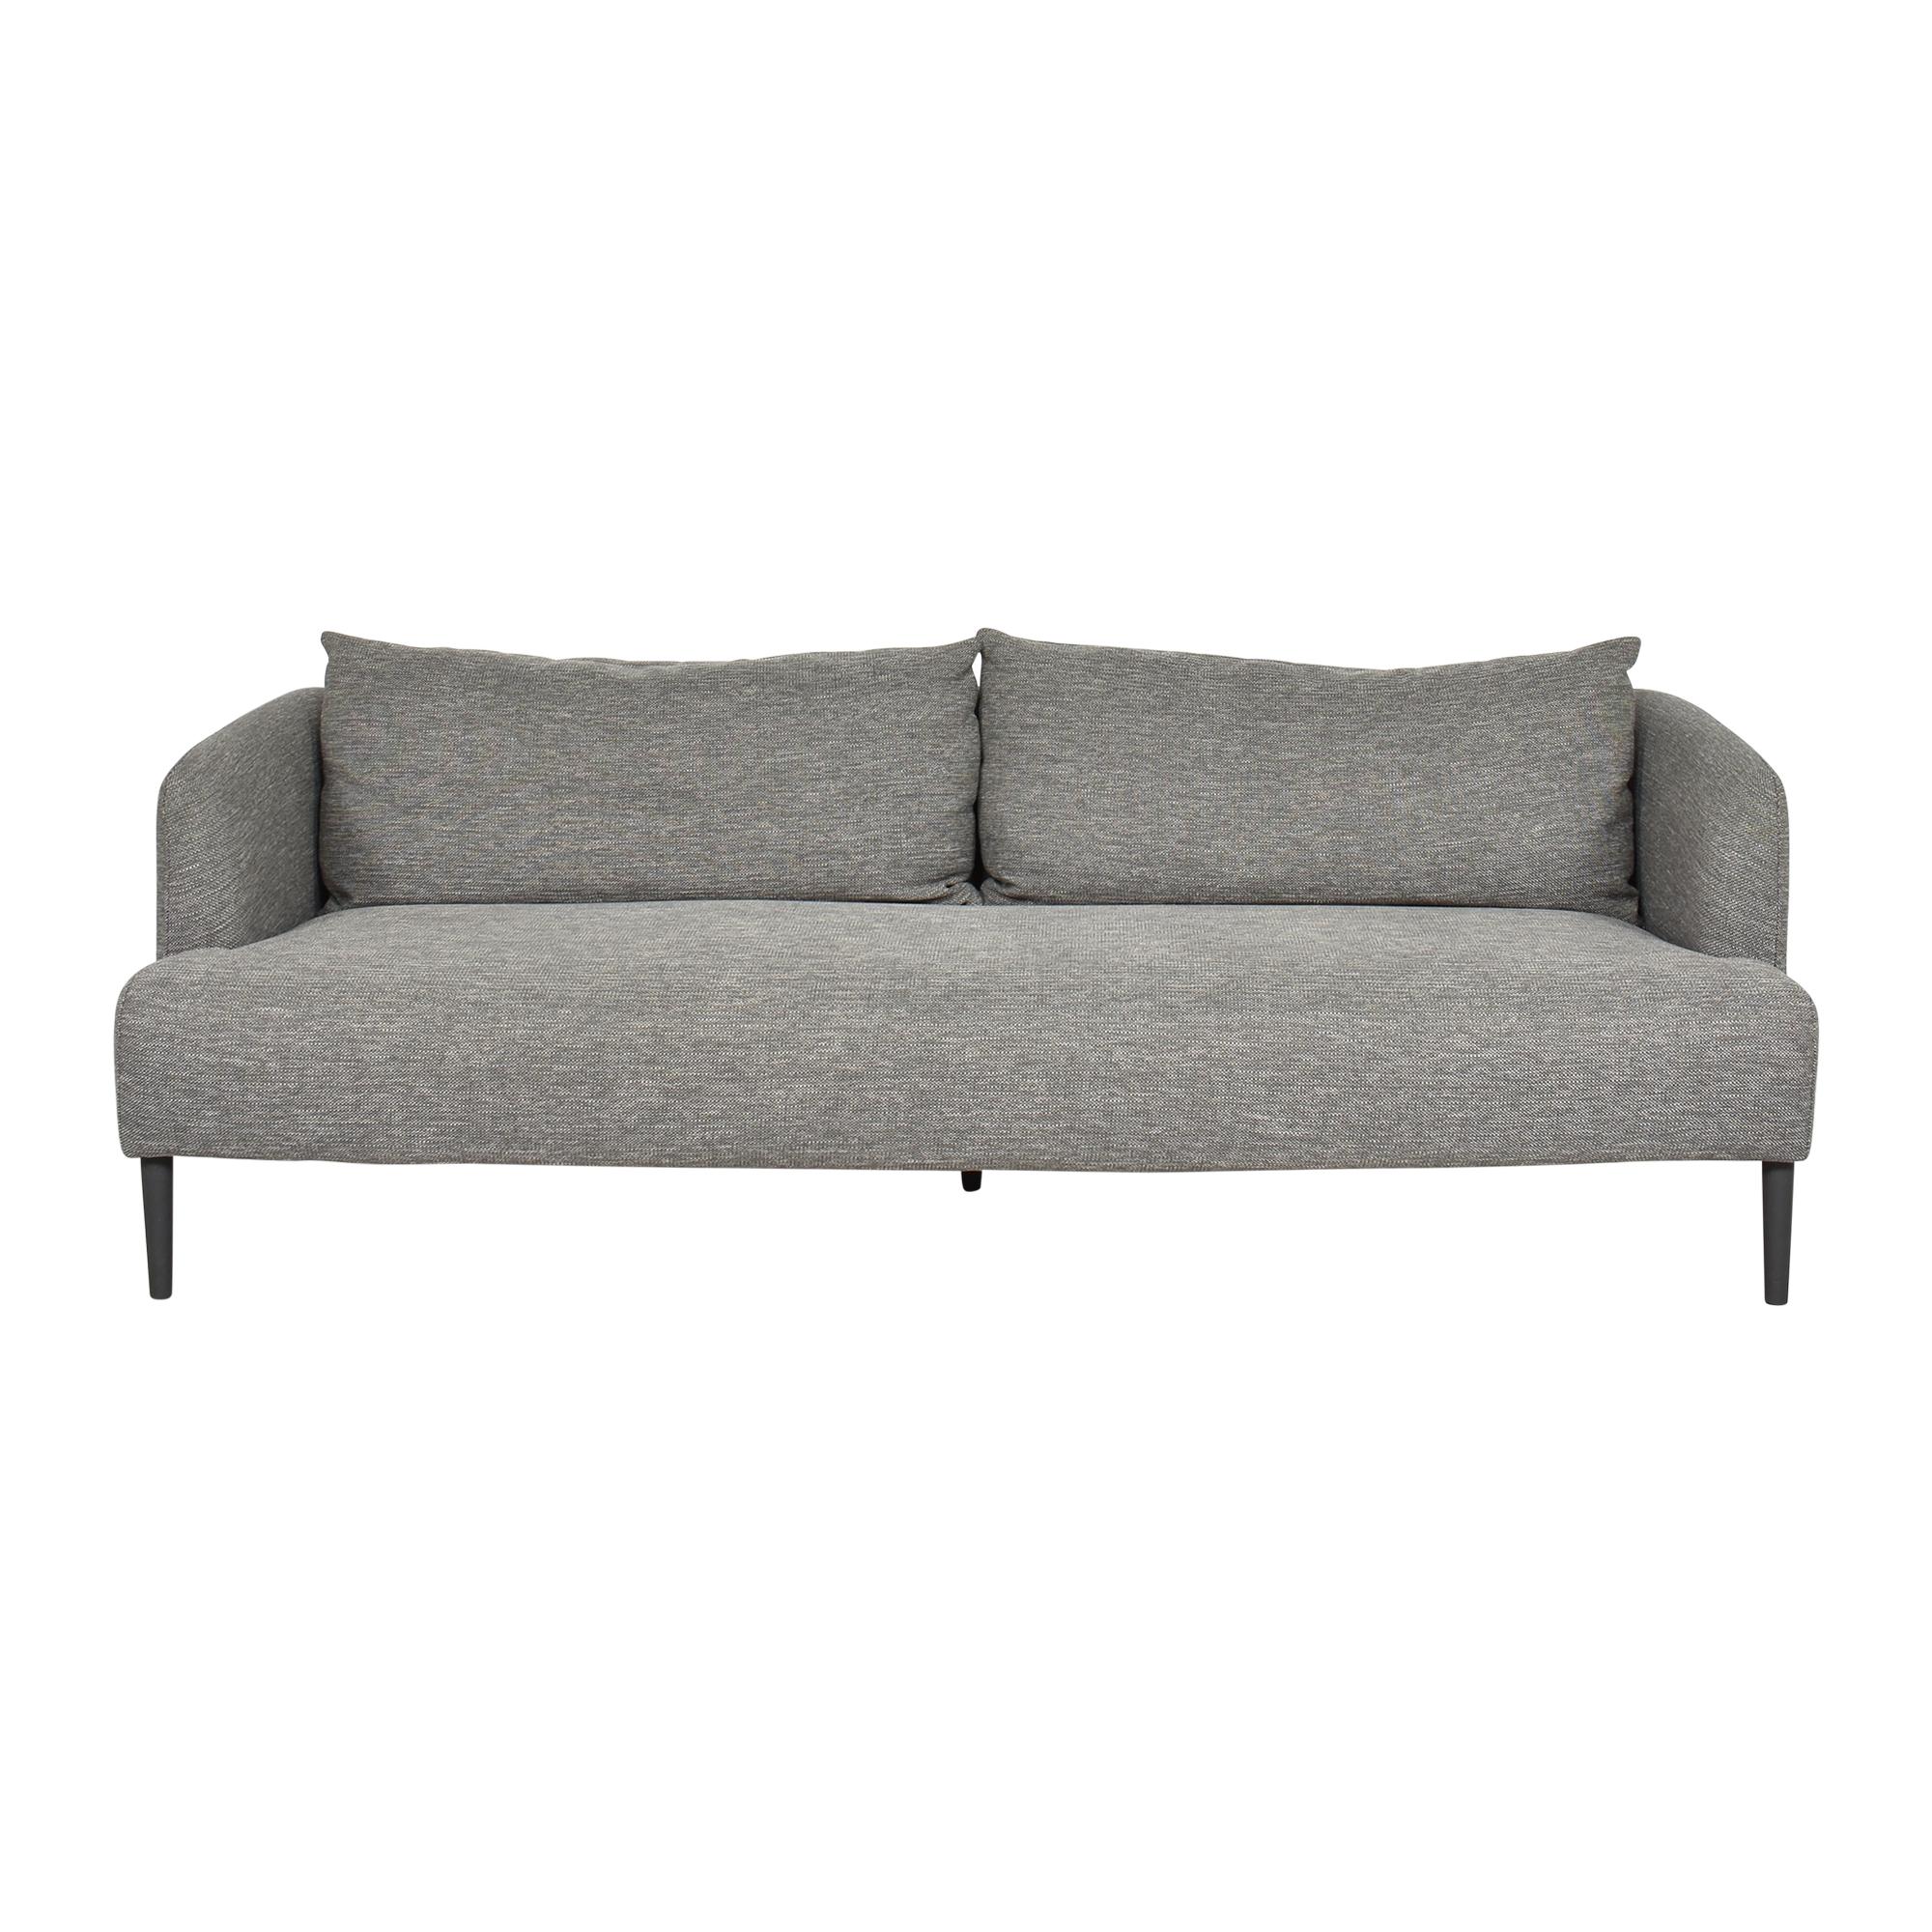 CB2 CB2 Ronan Bench Cushion Sofa dimensions